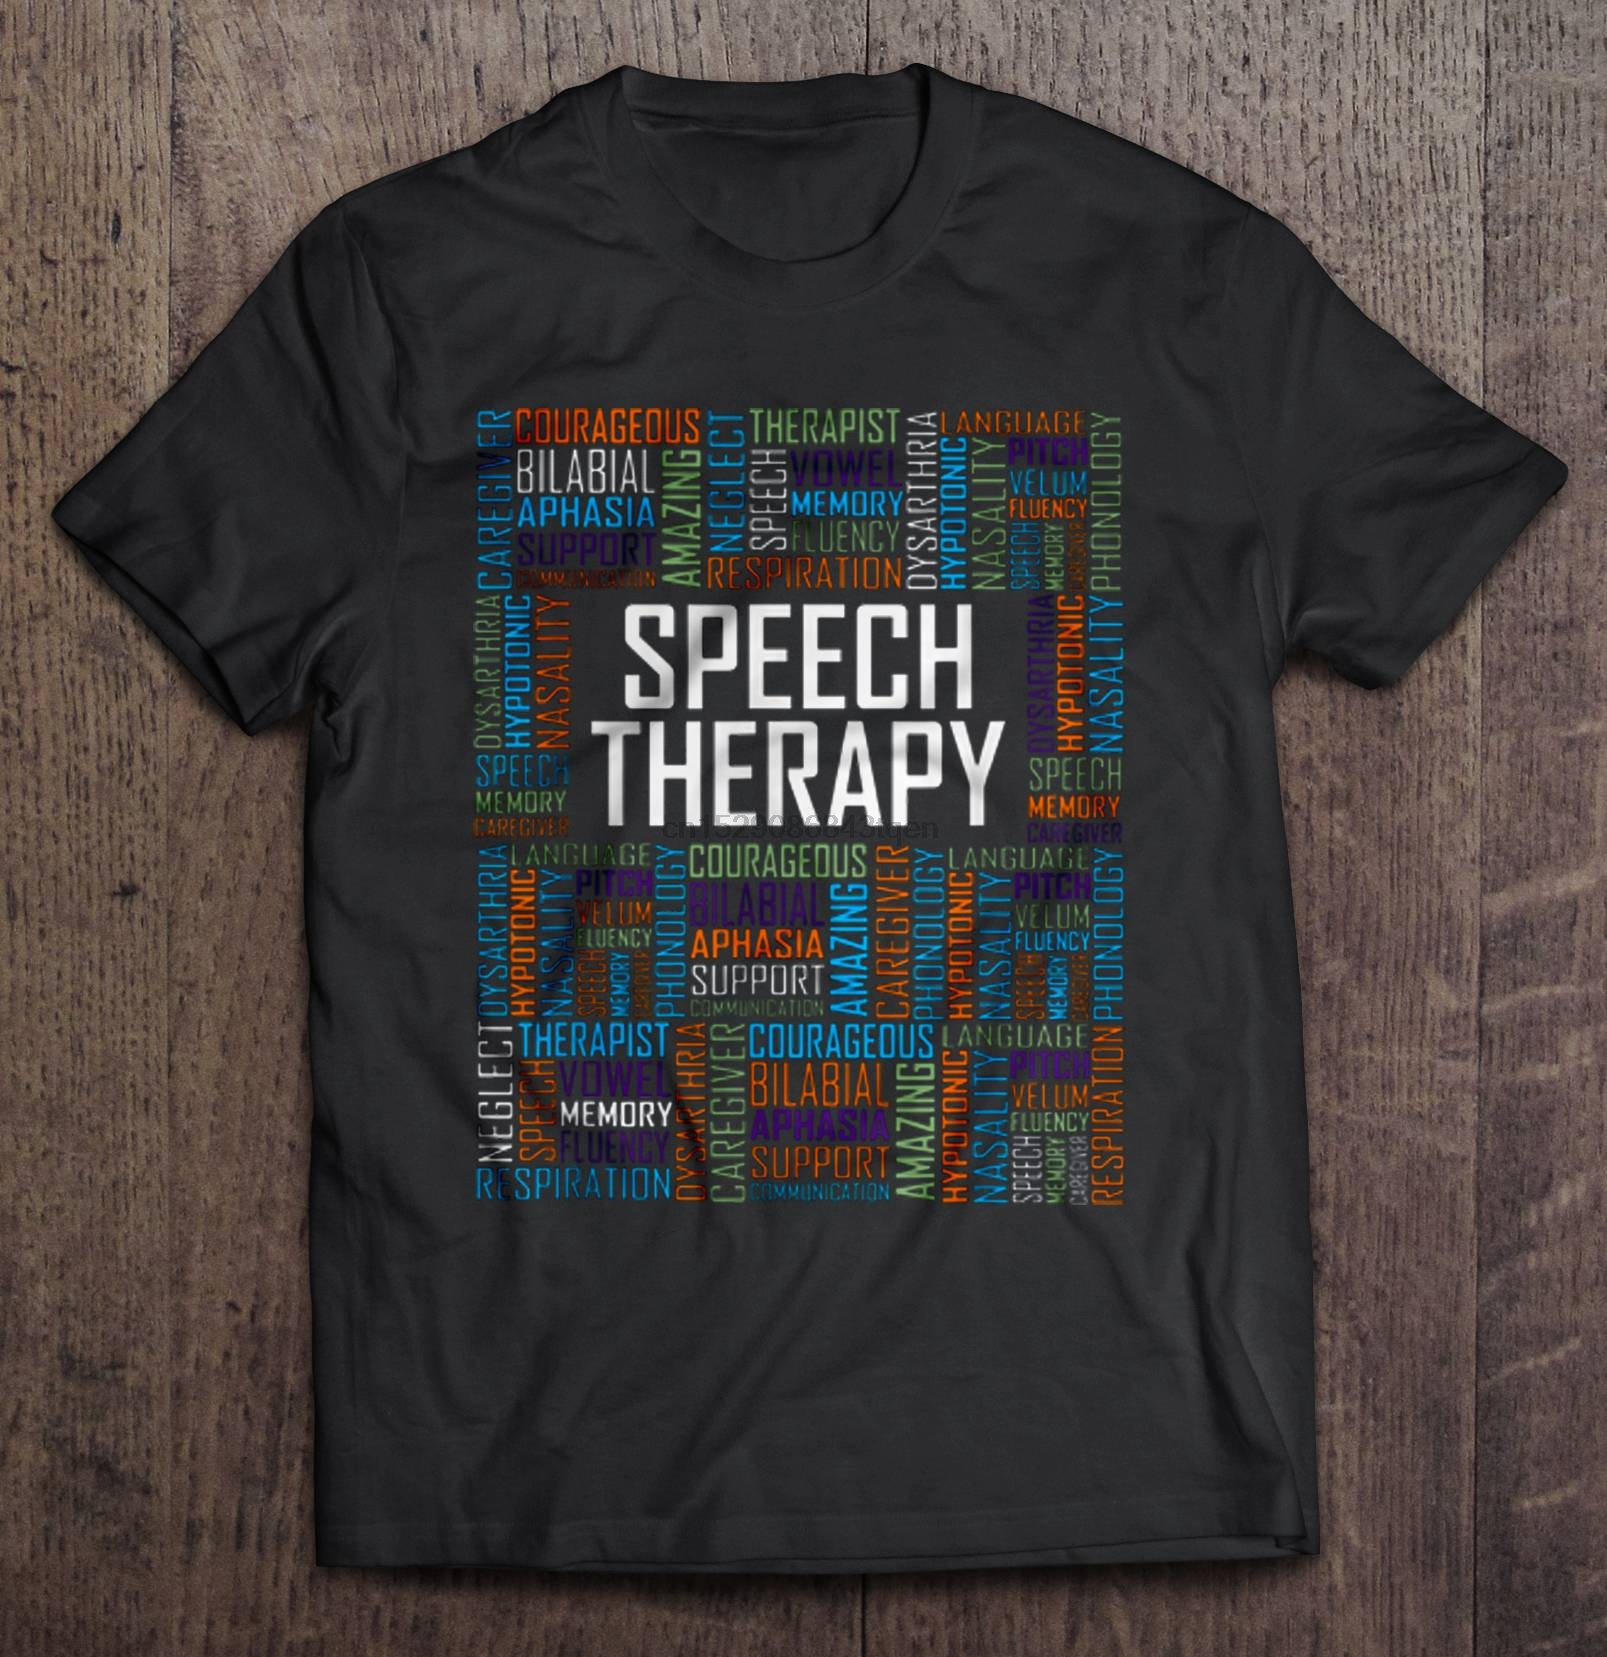 Men Funny T Shirt Fashion tshirt Speech Therapy Caregiver Courageous Bilabial Aphasia Therapist Women t-shirt(China)